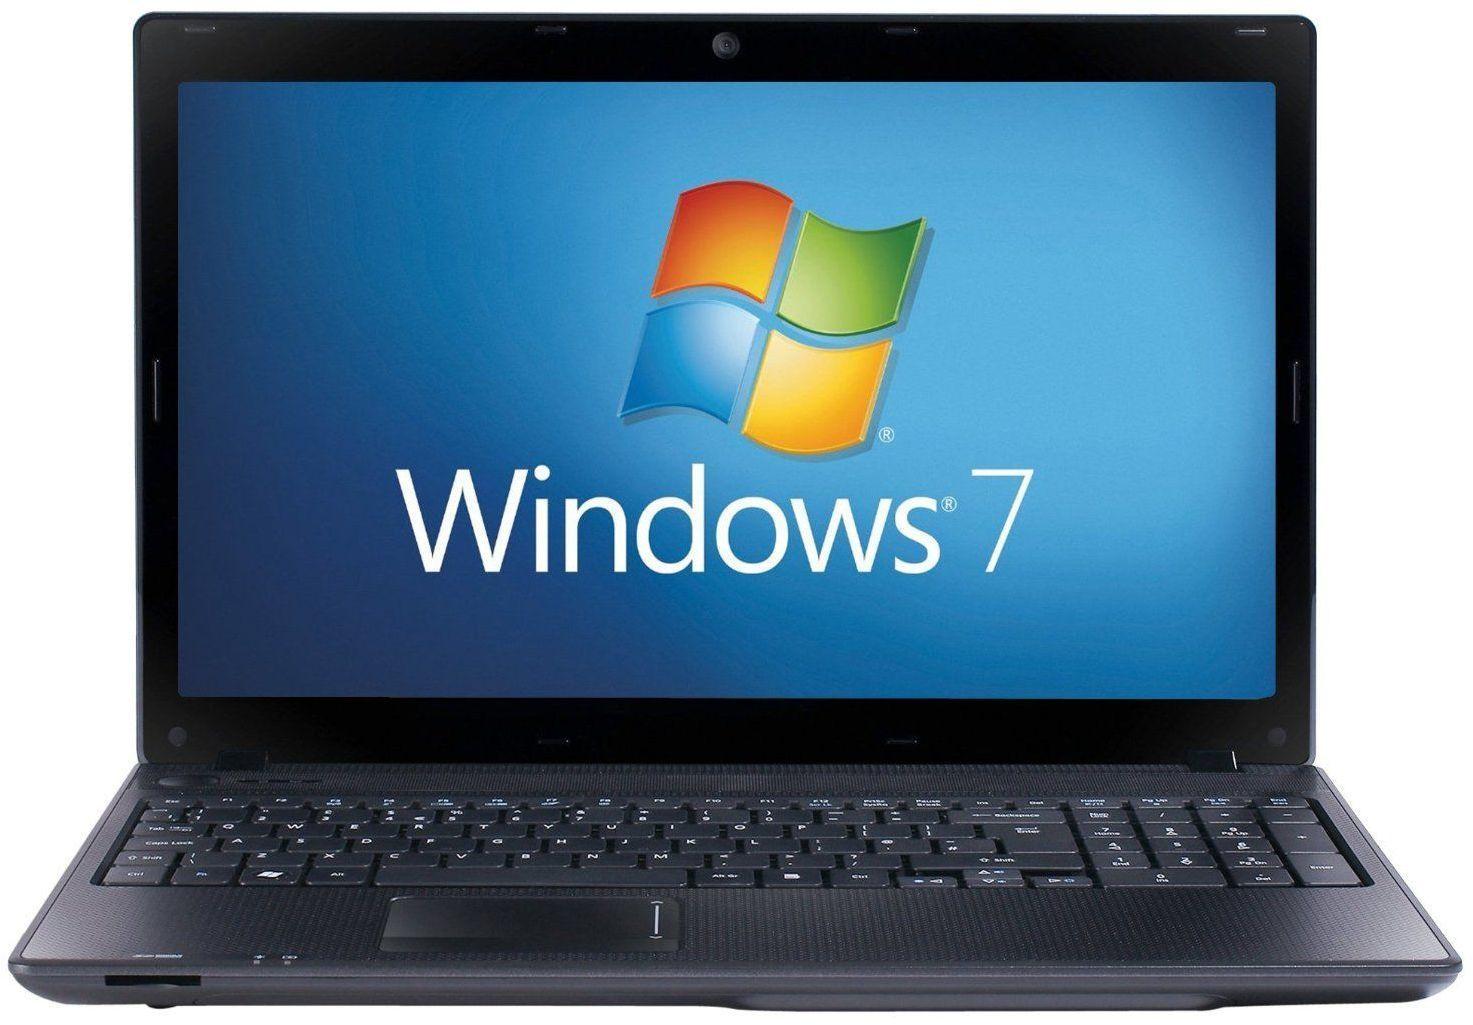 Acer Aspire 5336 Windows 7 Laptop Rapid Pcs